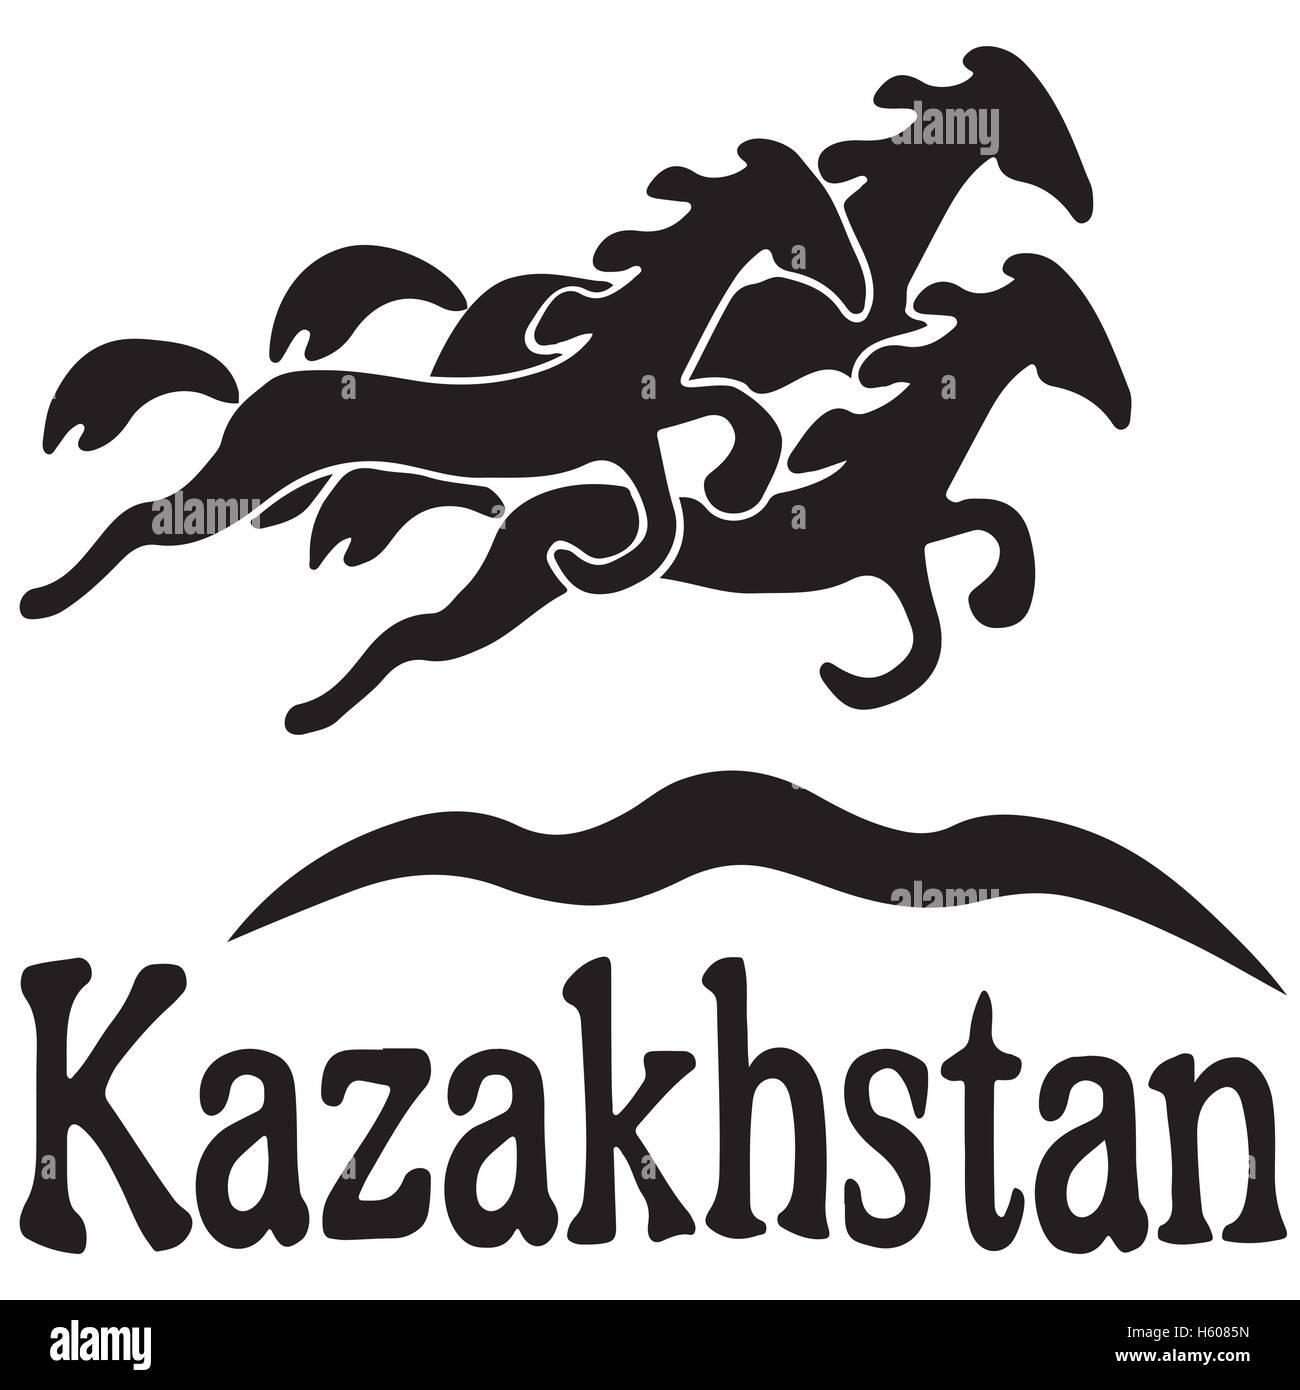 Republic of Kazakhstan logo art poster. Vector. EPS - Stock Vector